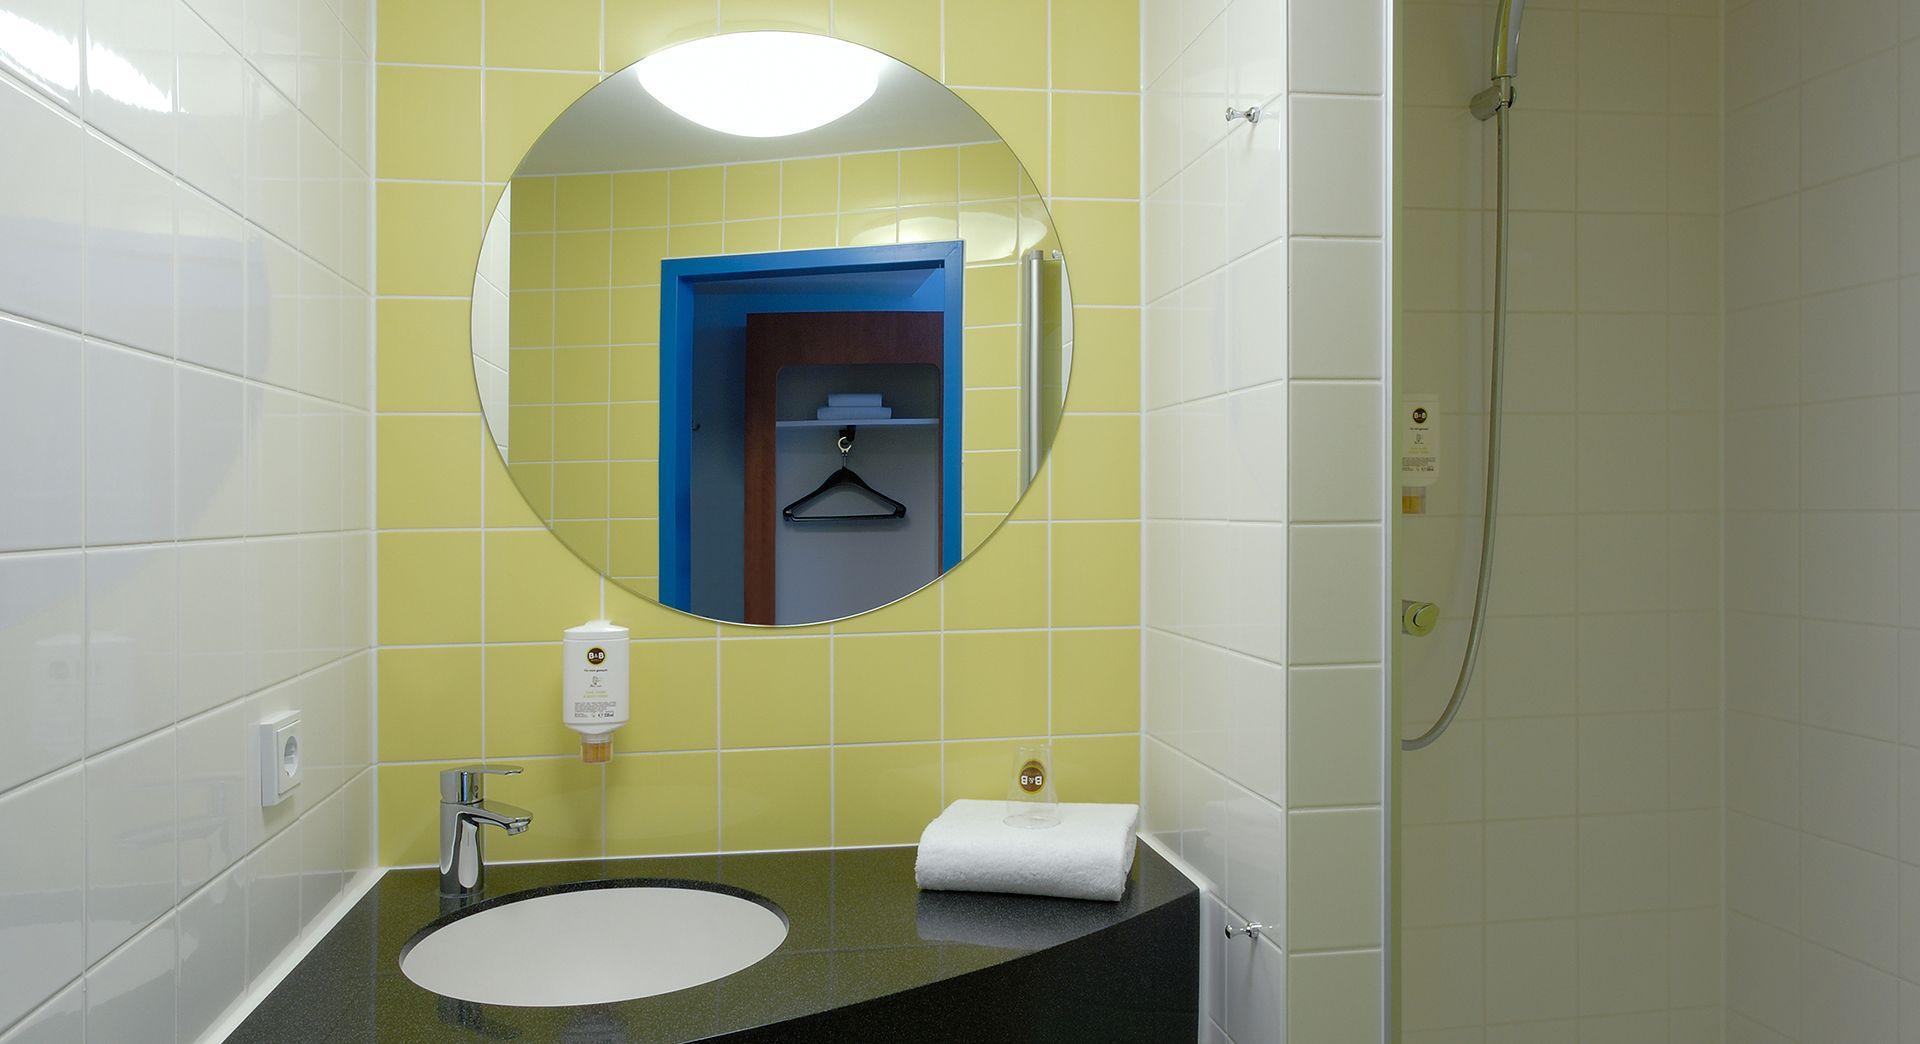 Tv Badezimmer ~ Badezimmer im b b hotel düsseldorf hbf düsseldorf